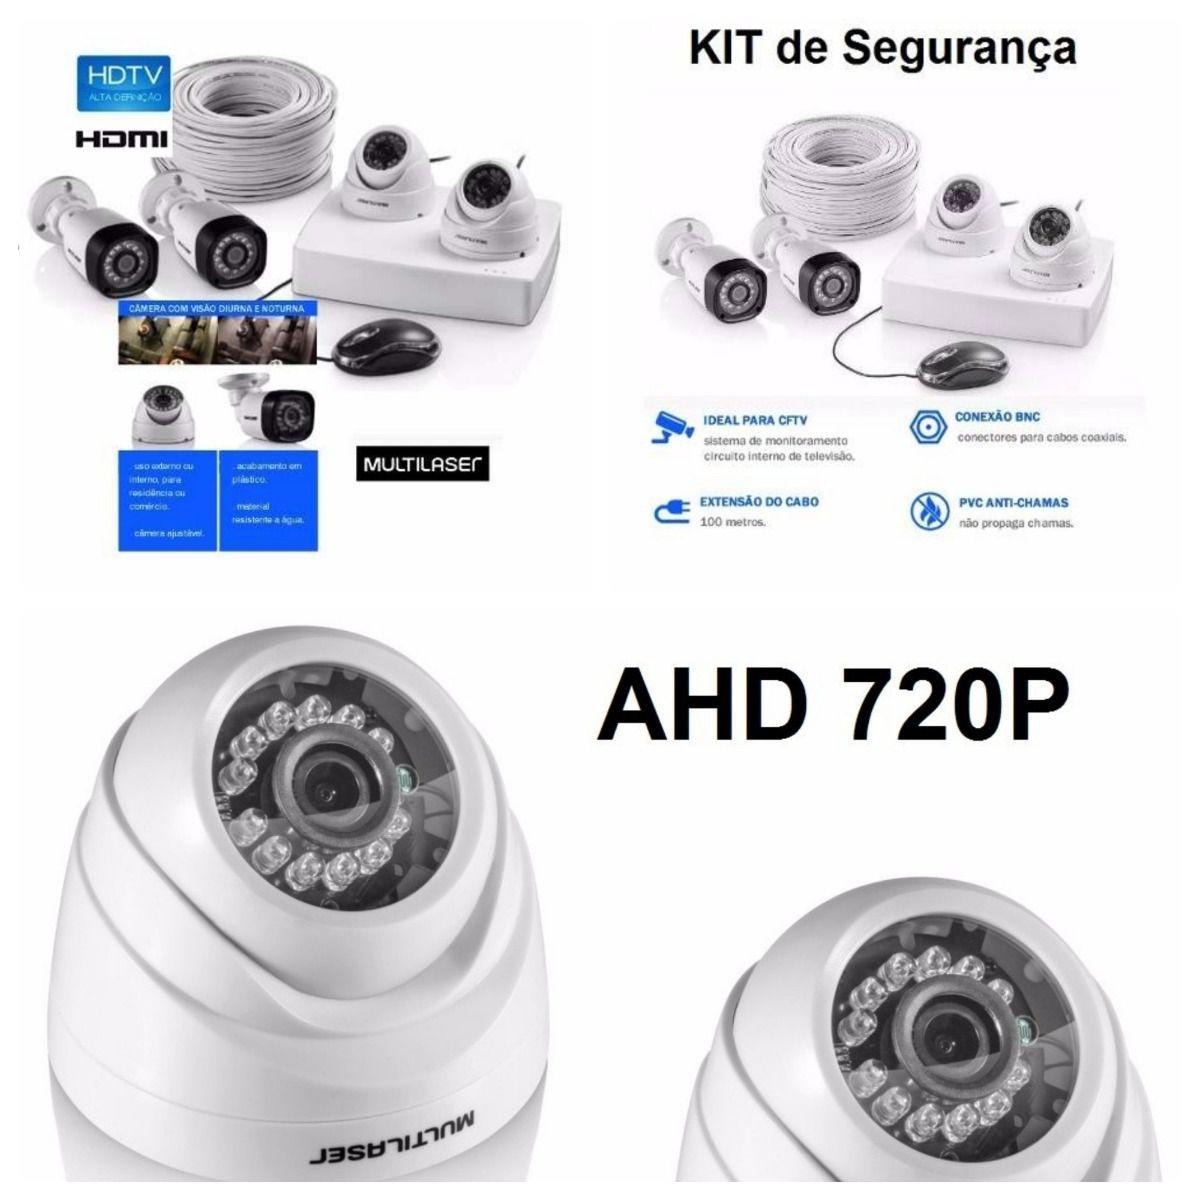 Kit DVR 1080N 4 Canais + 4 Câmeras AHD 720P 1/4 3.6MM SE118 Multilaser  - Eletroinfocia